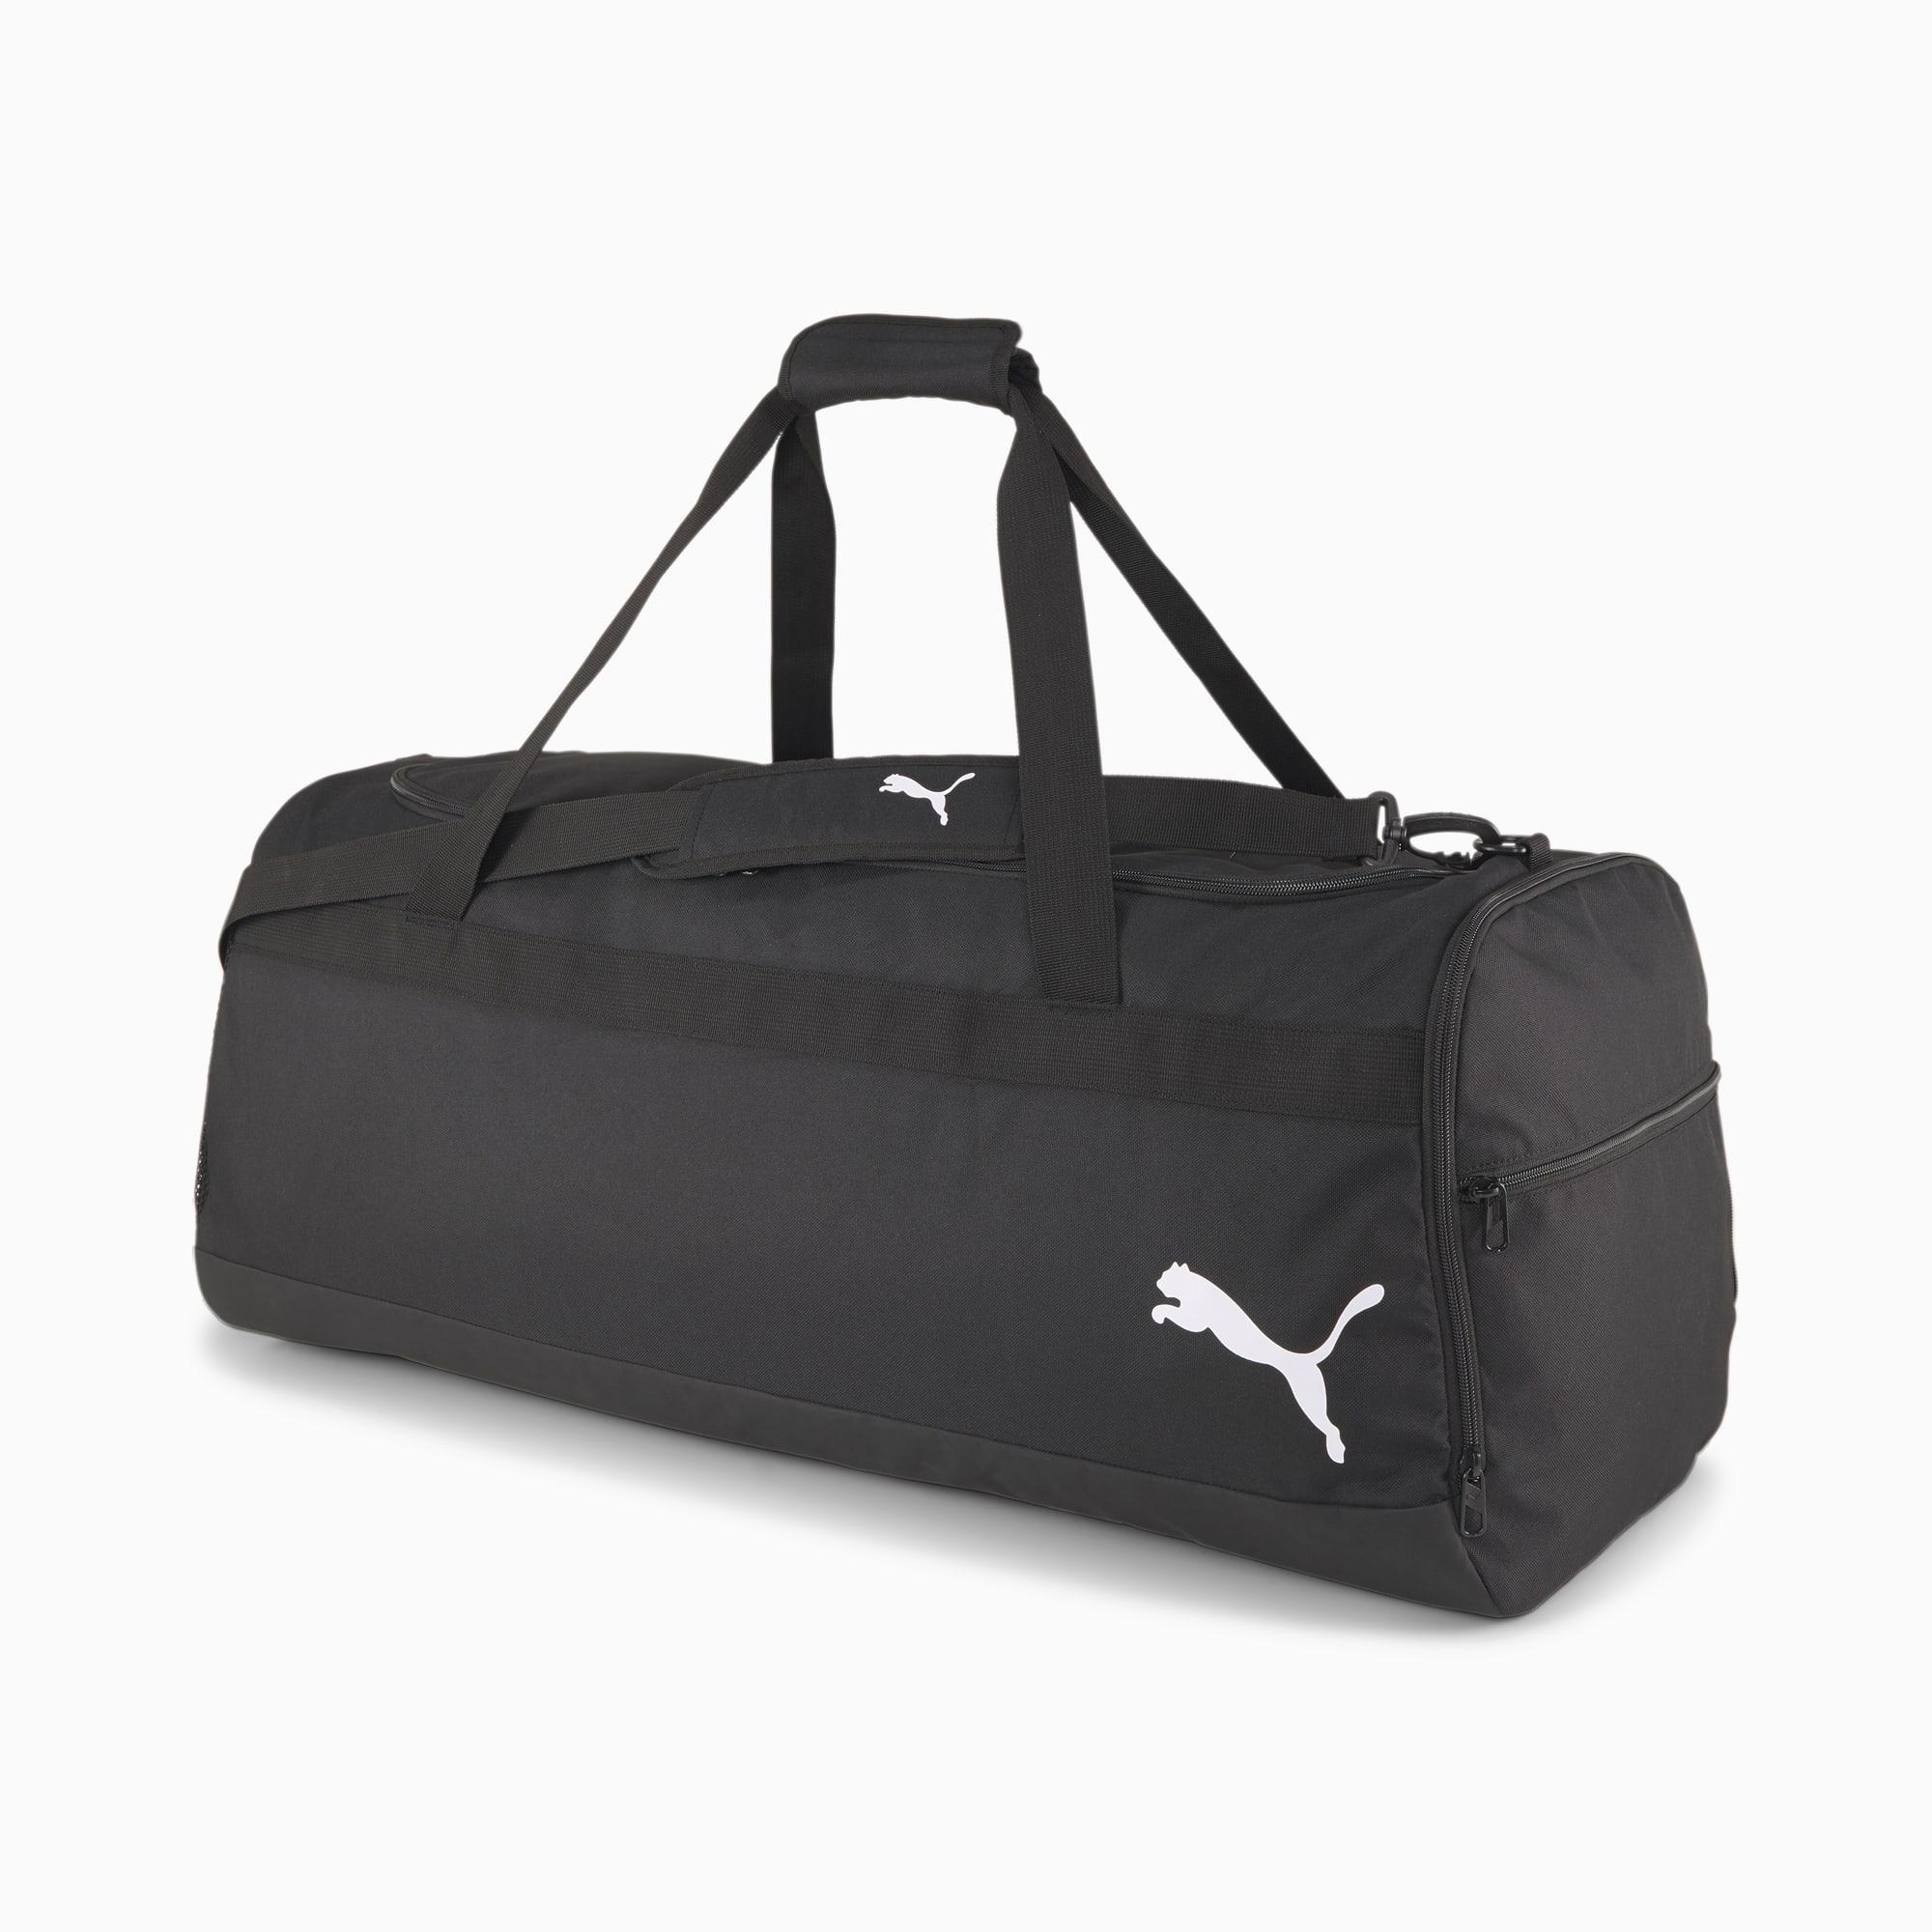 teamGOAL Large Duffel Bag